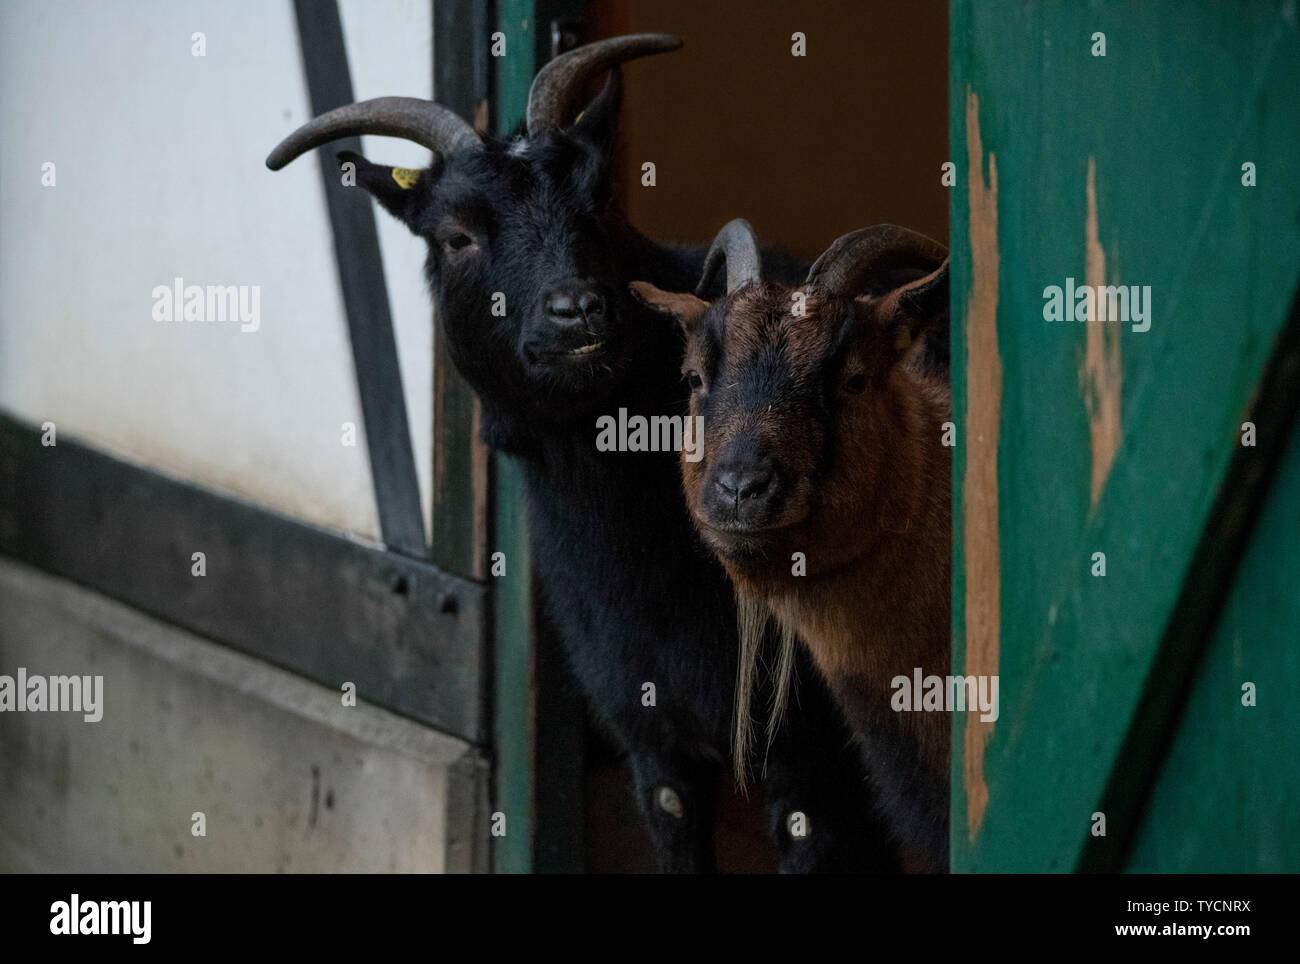 pygmy goat, Velbert, Germany, Europe - Stock Image